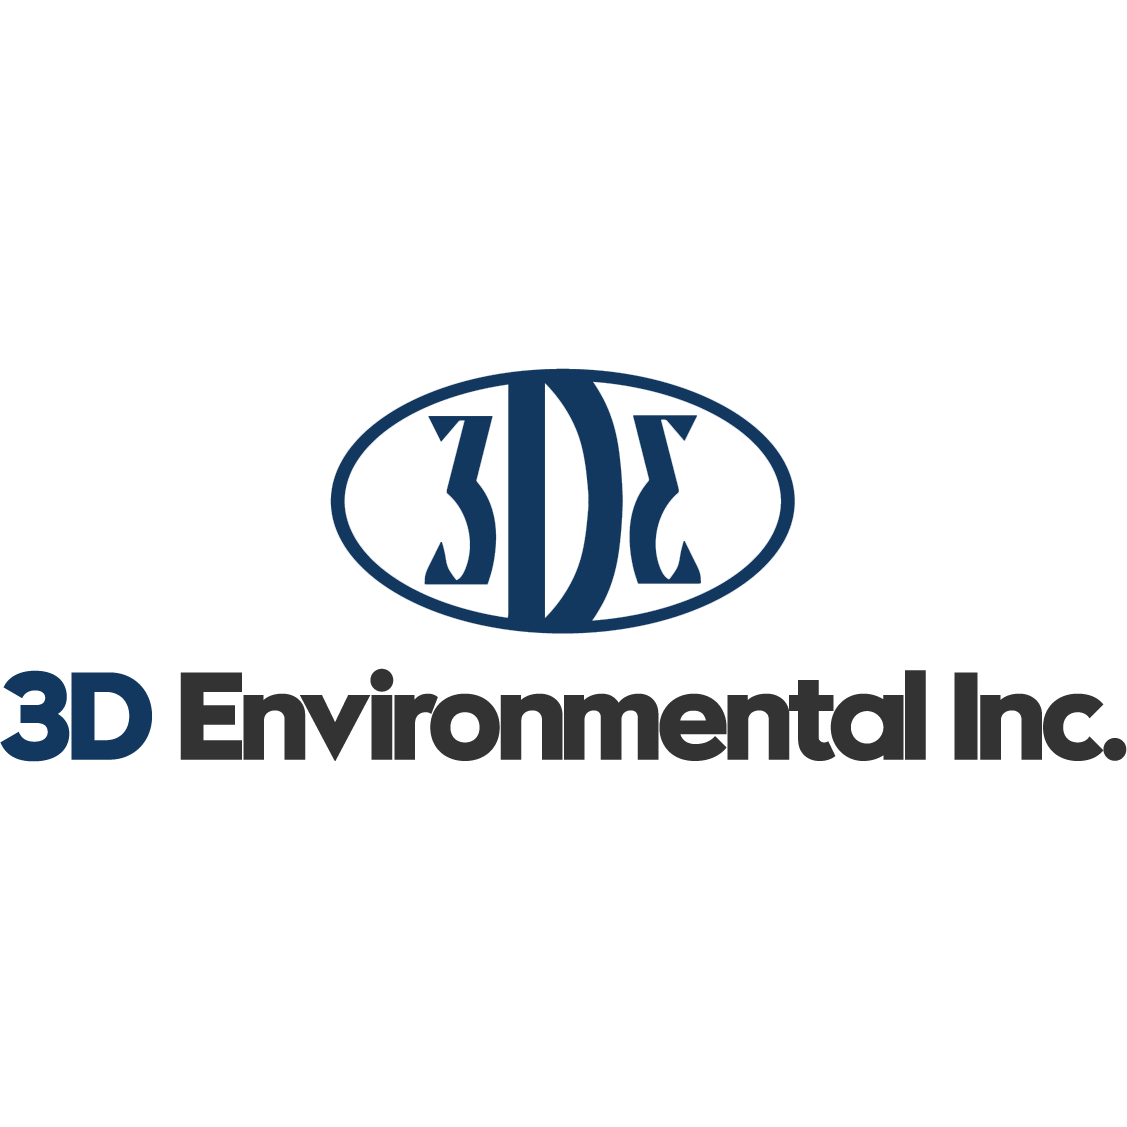 3D Environmental Inc